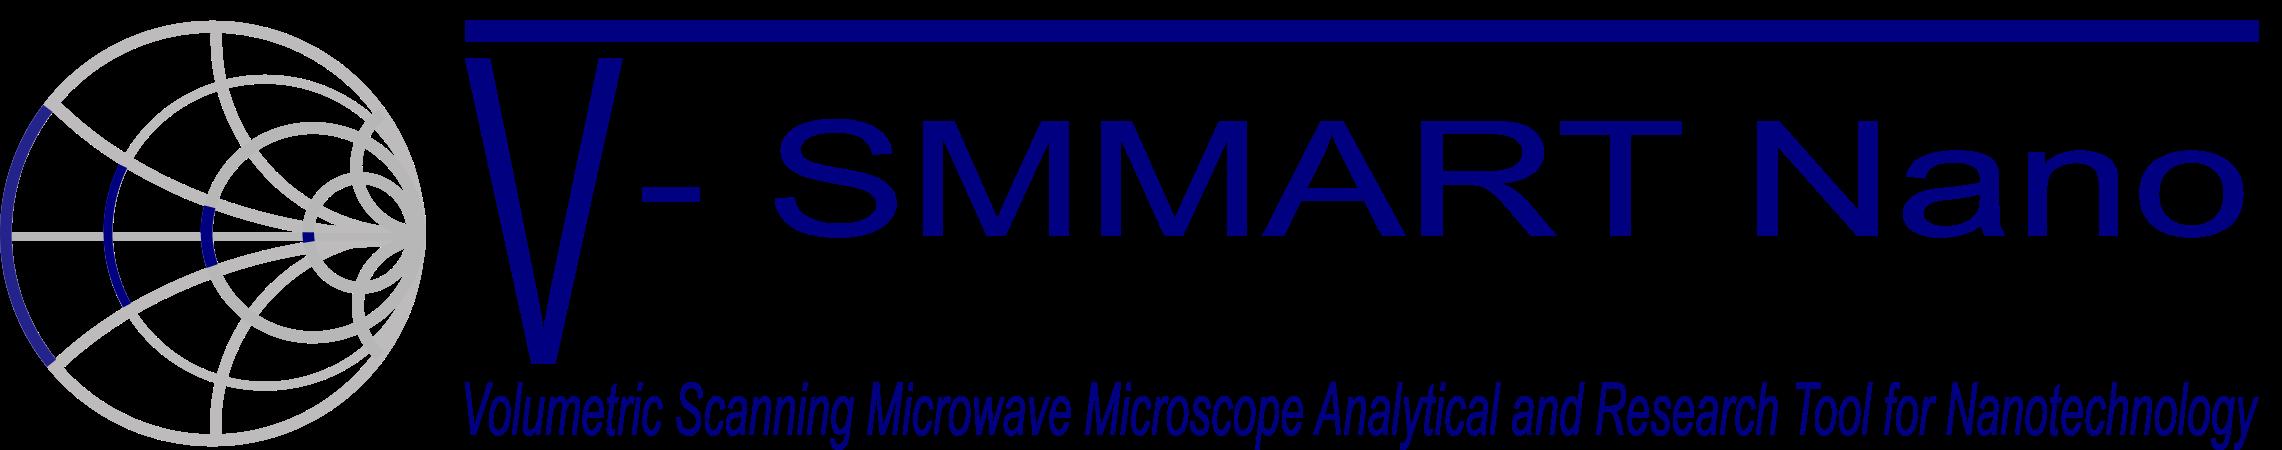 VSMMART-projectlogo